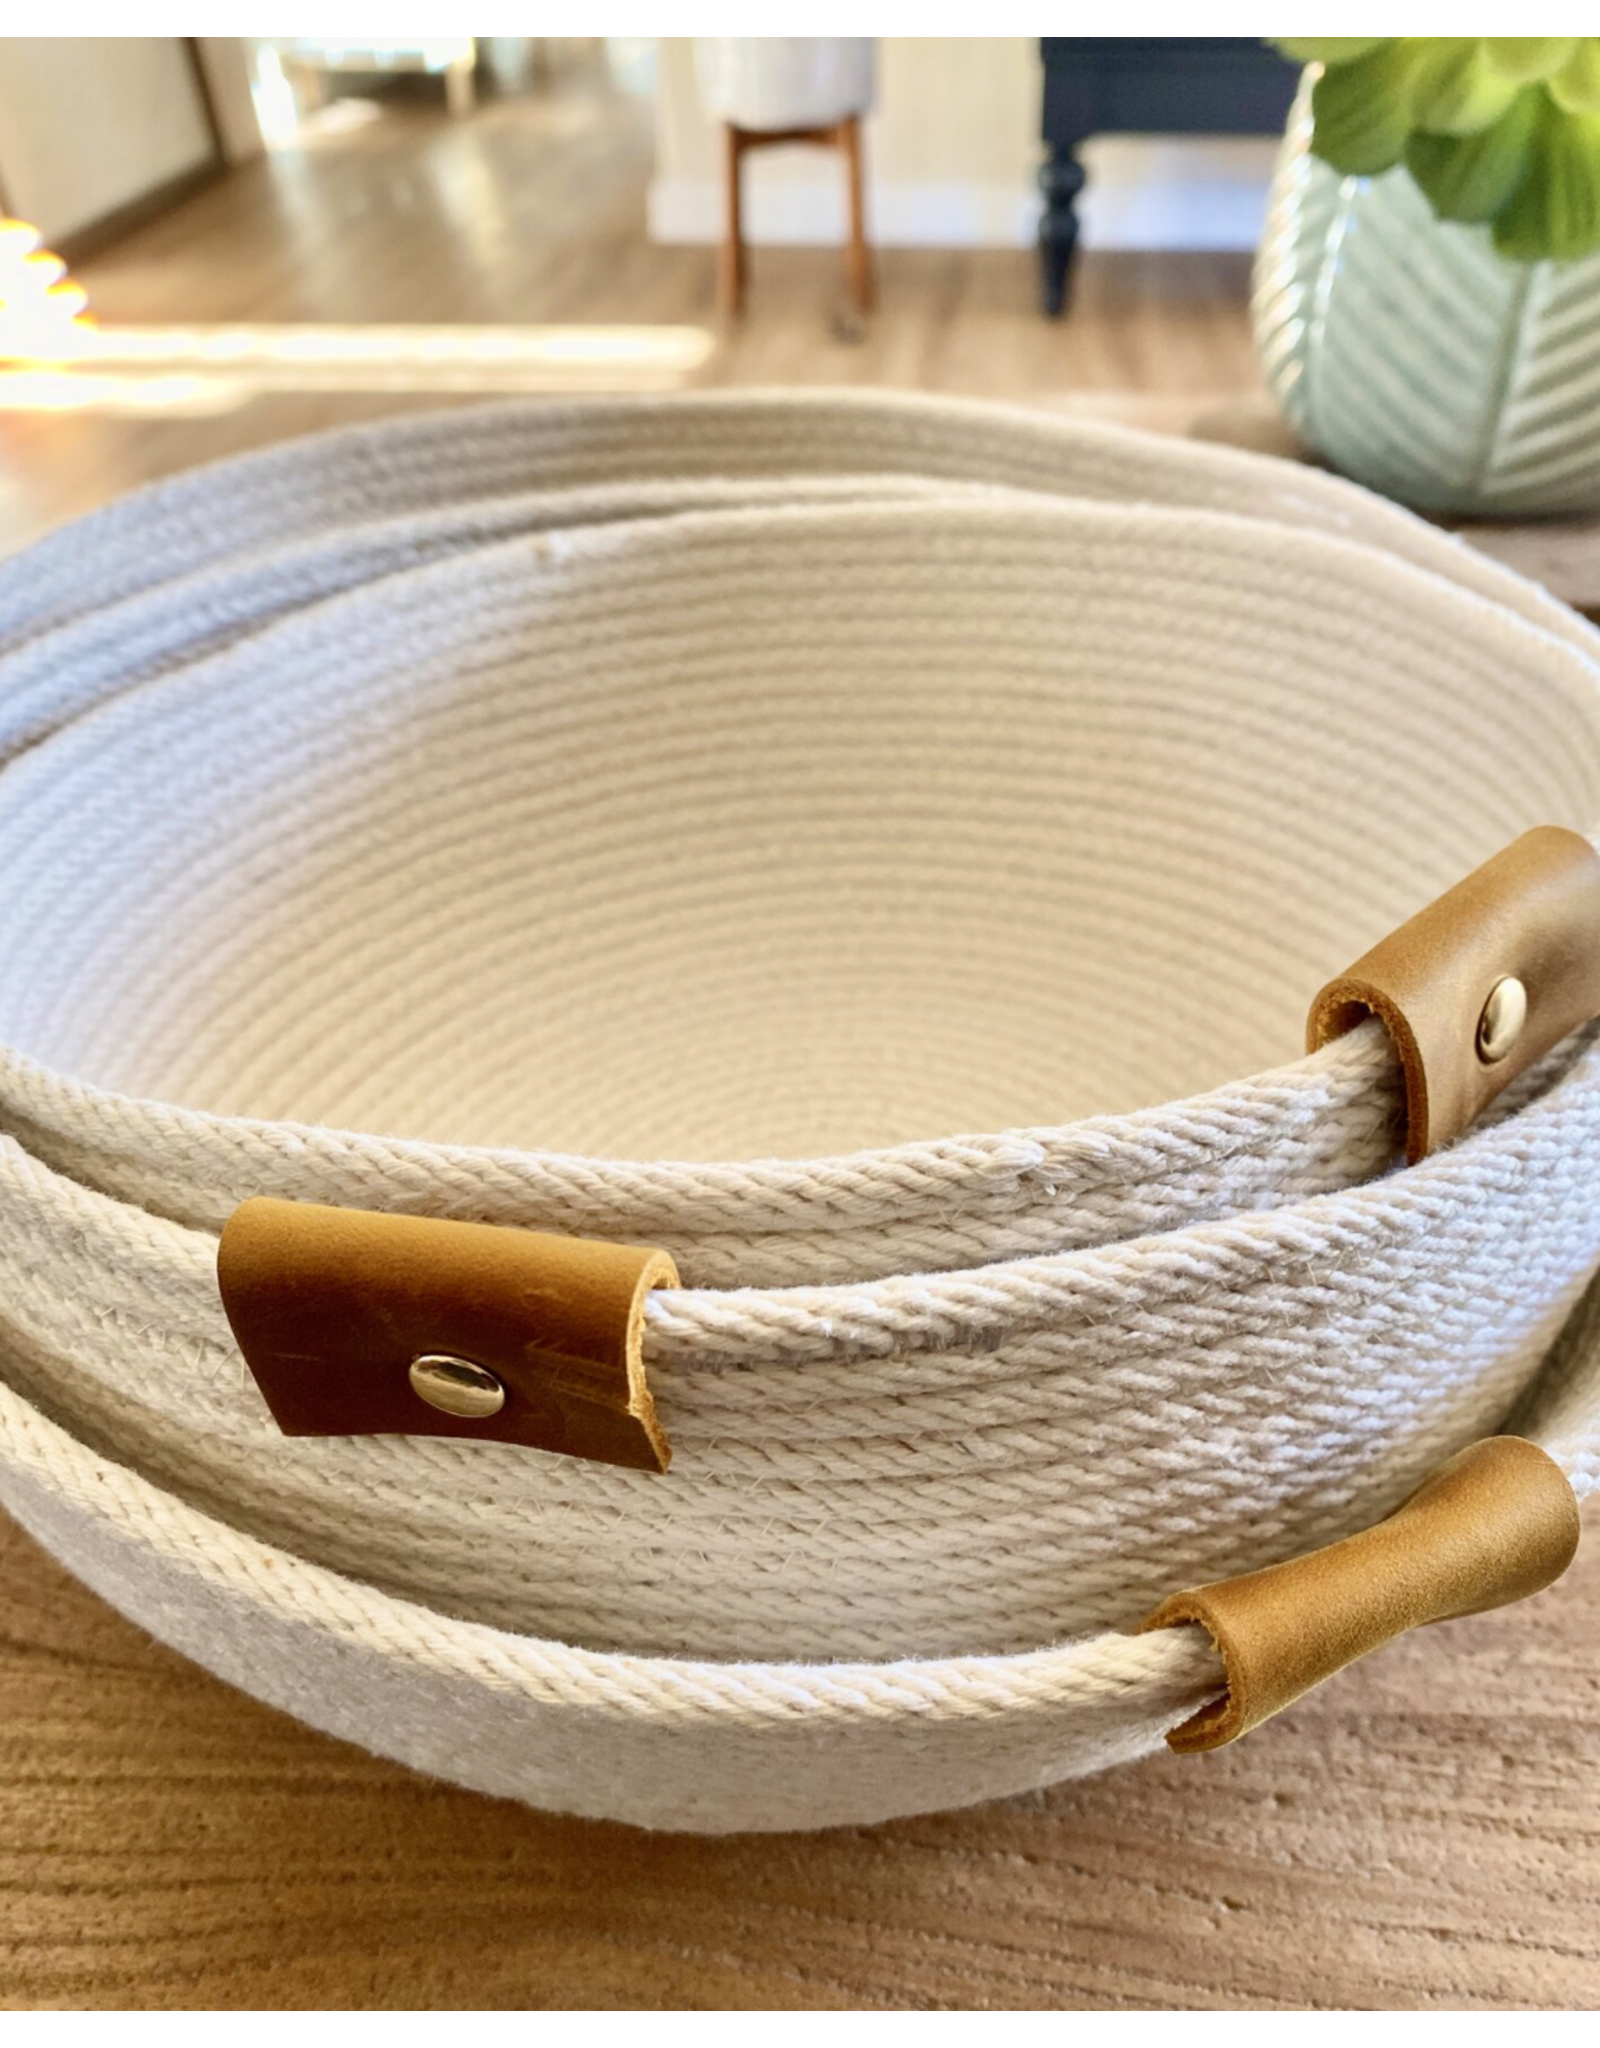 Printworthy Arts Coil Basket | Macy Possenti